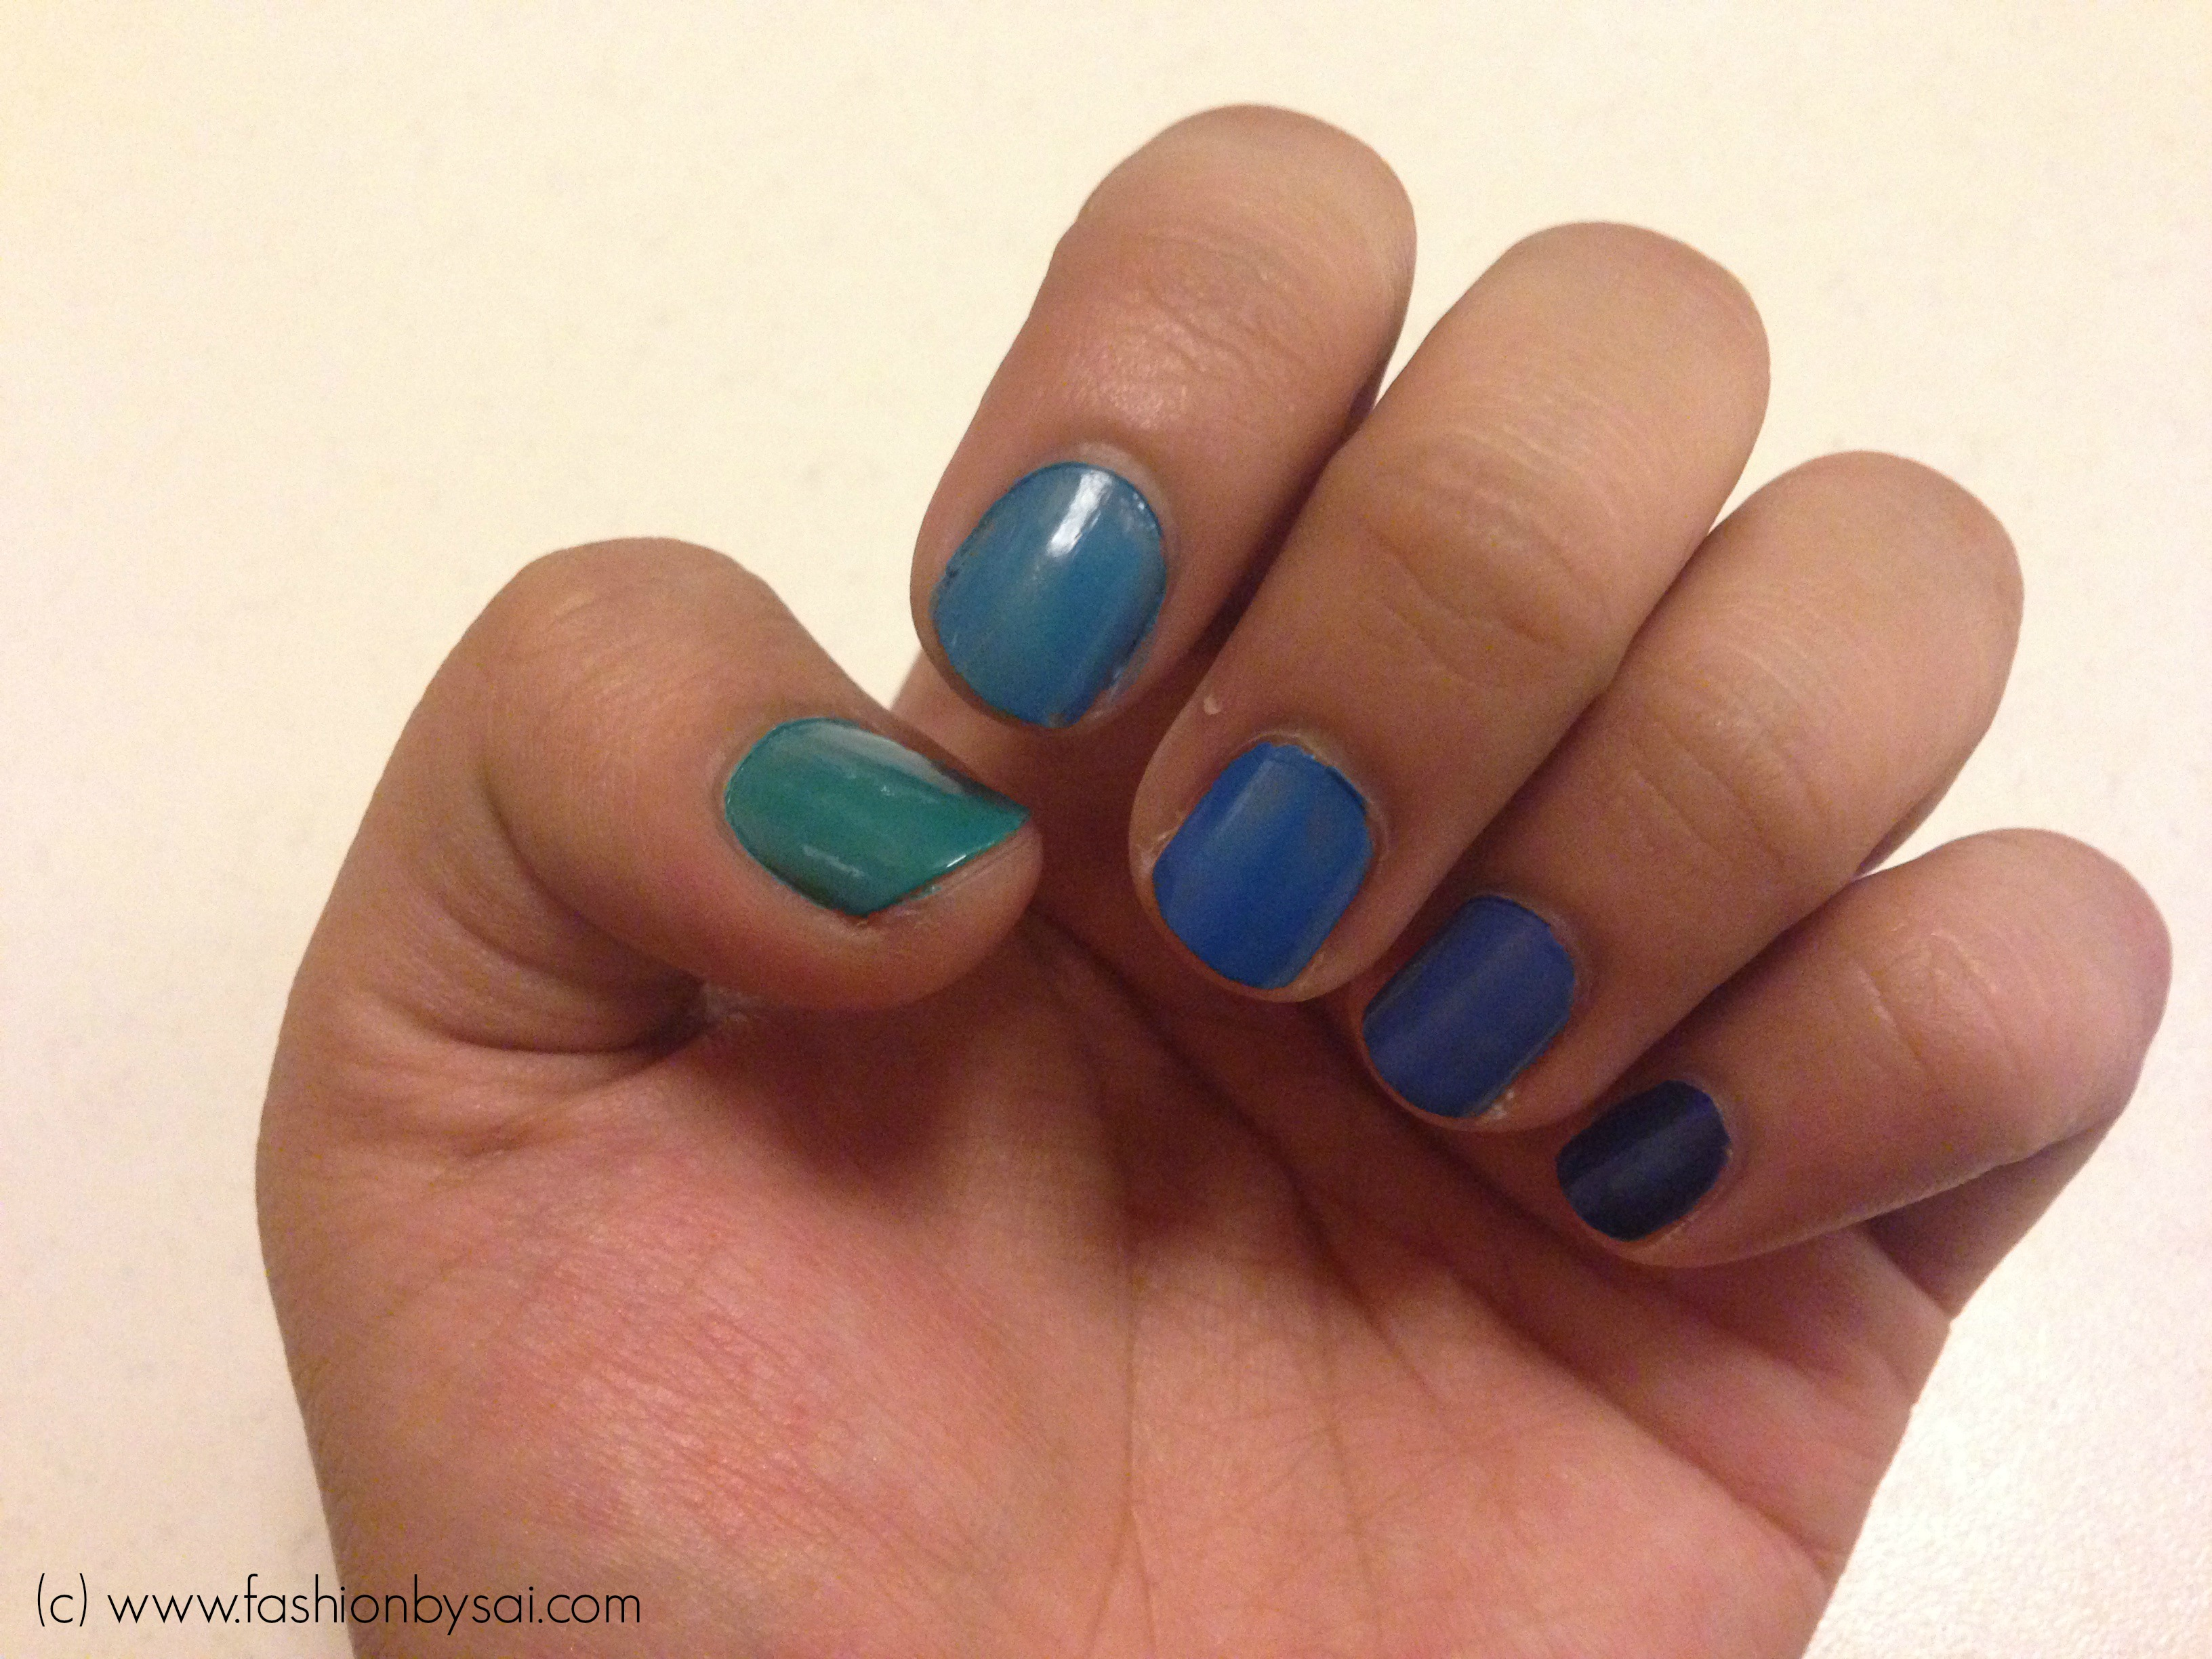 Inglot Philippines nail polish art by beauty blogger Sai Montes